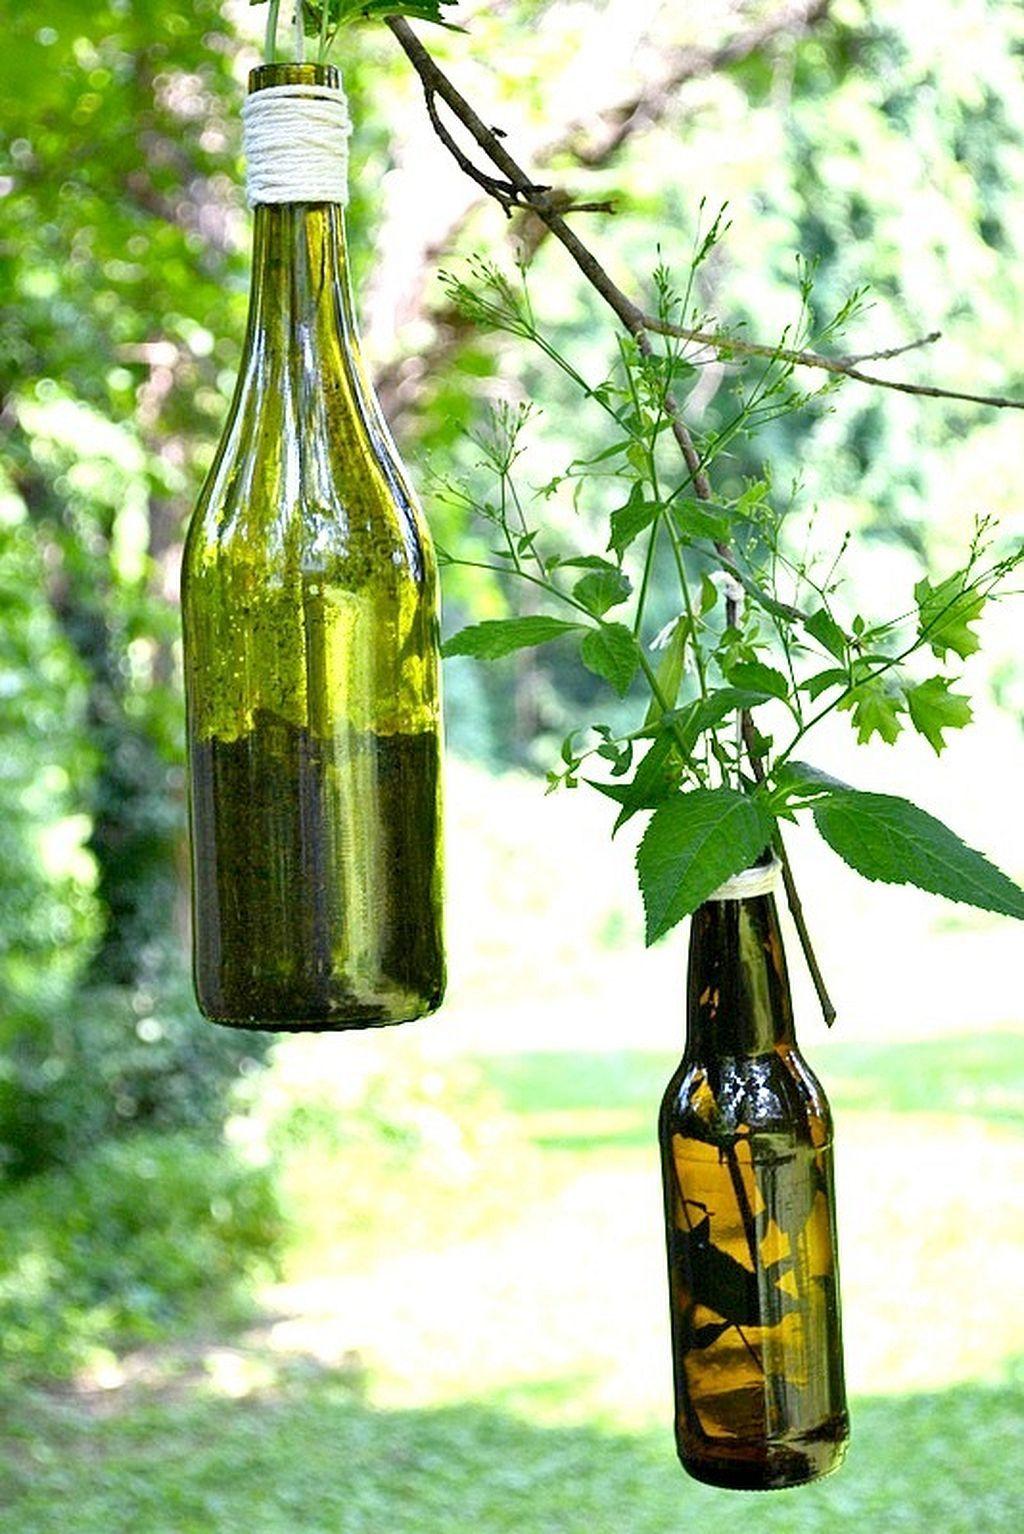 Awesome 17 Wine Bottle Plant Hanger Ideas https://gardenmagz.com/17 ...